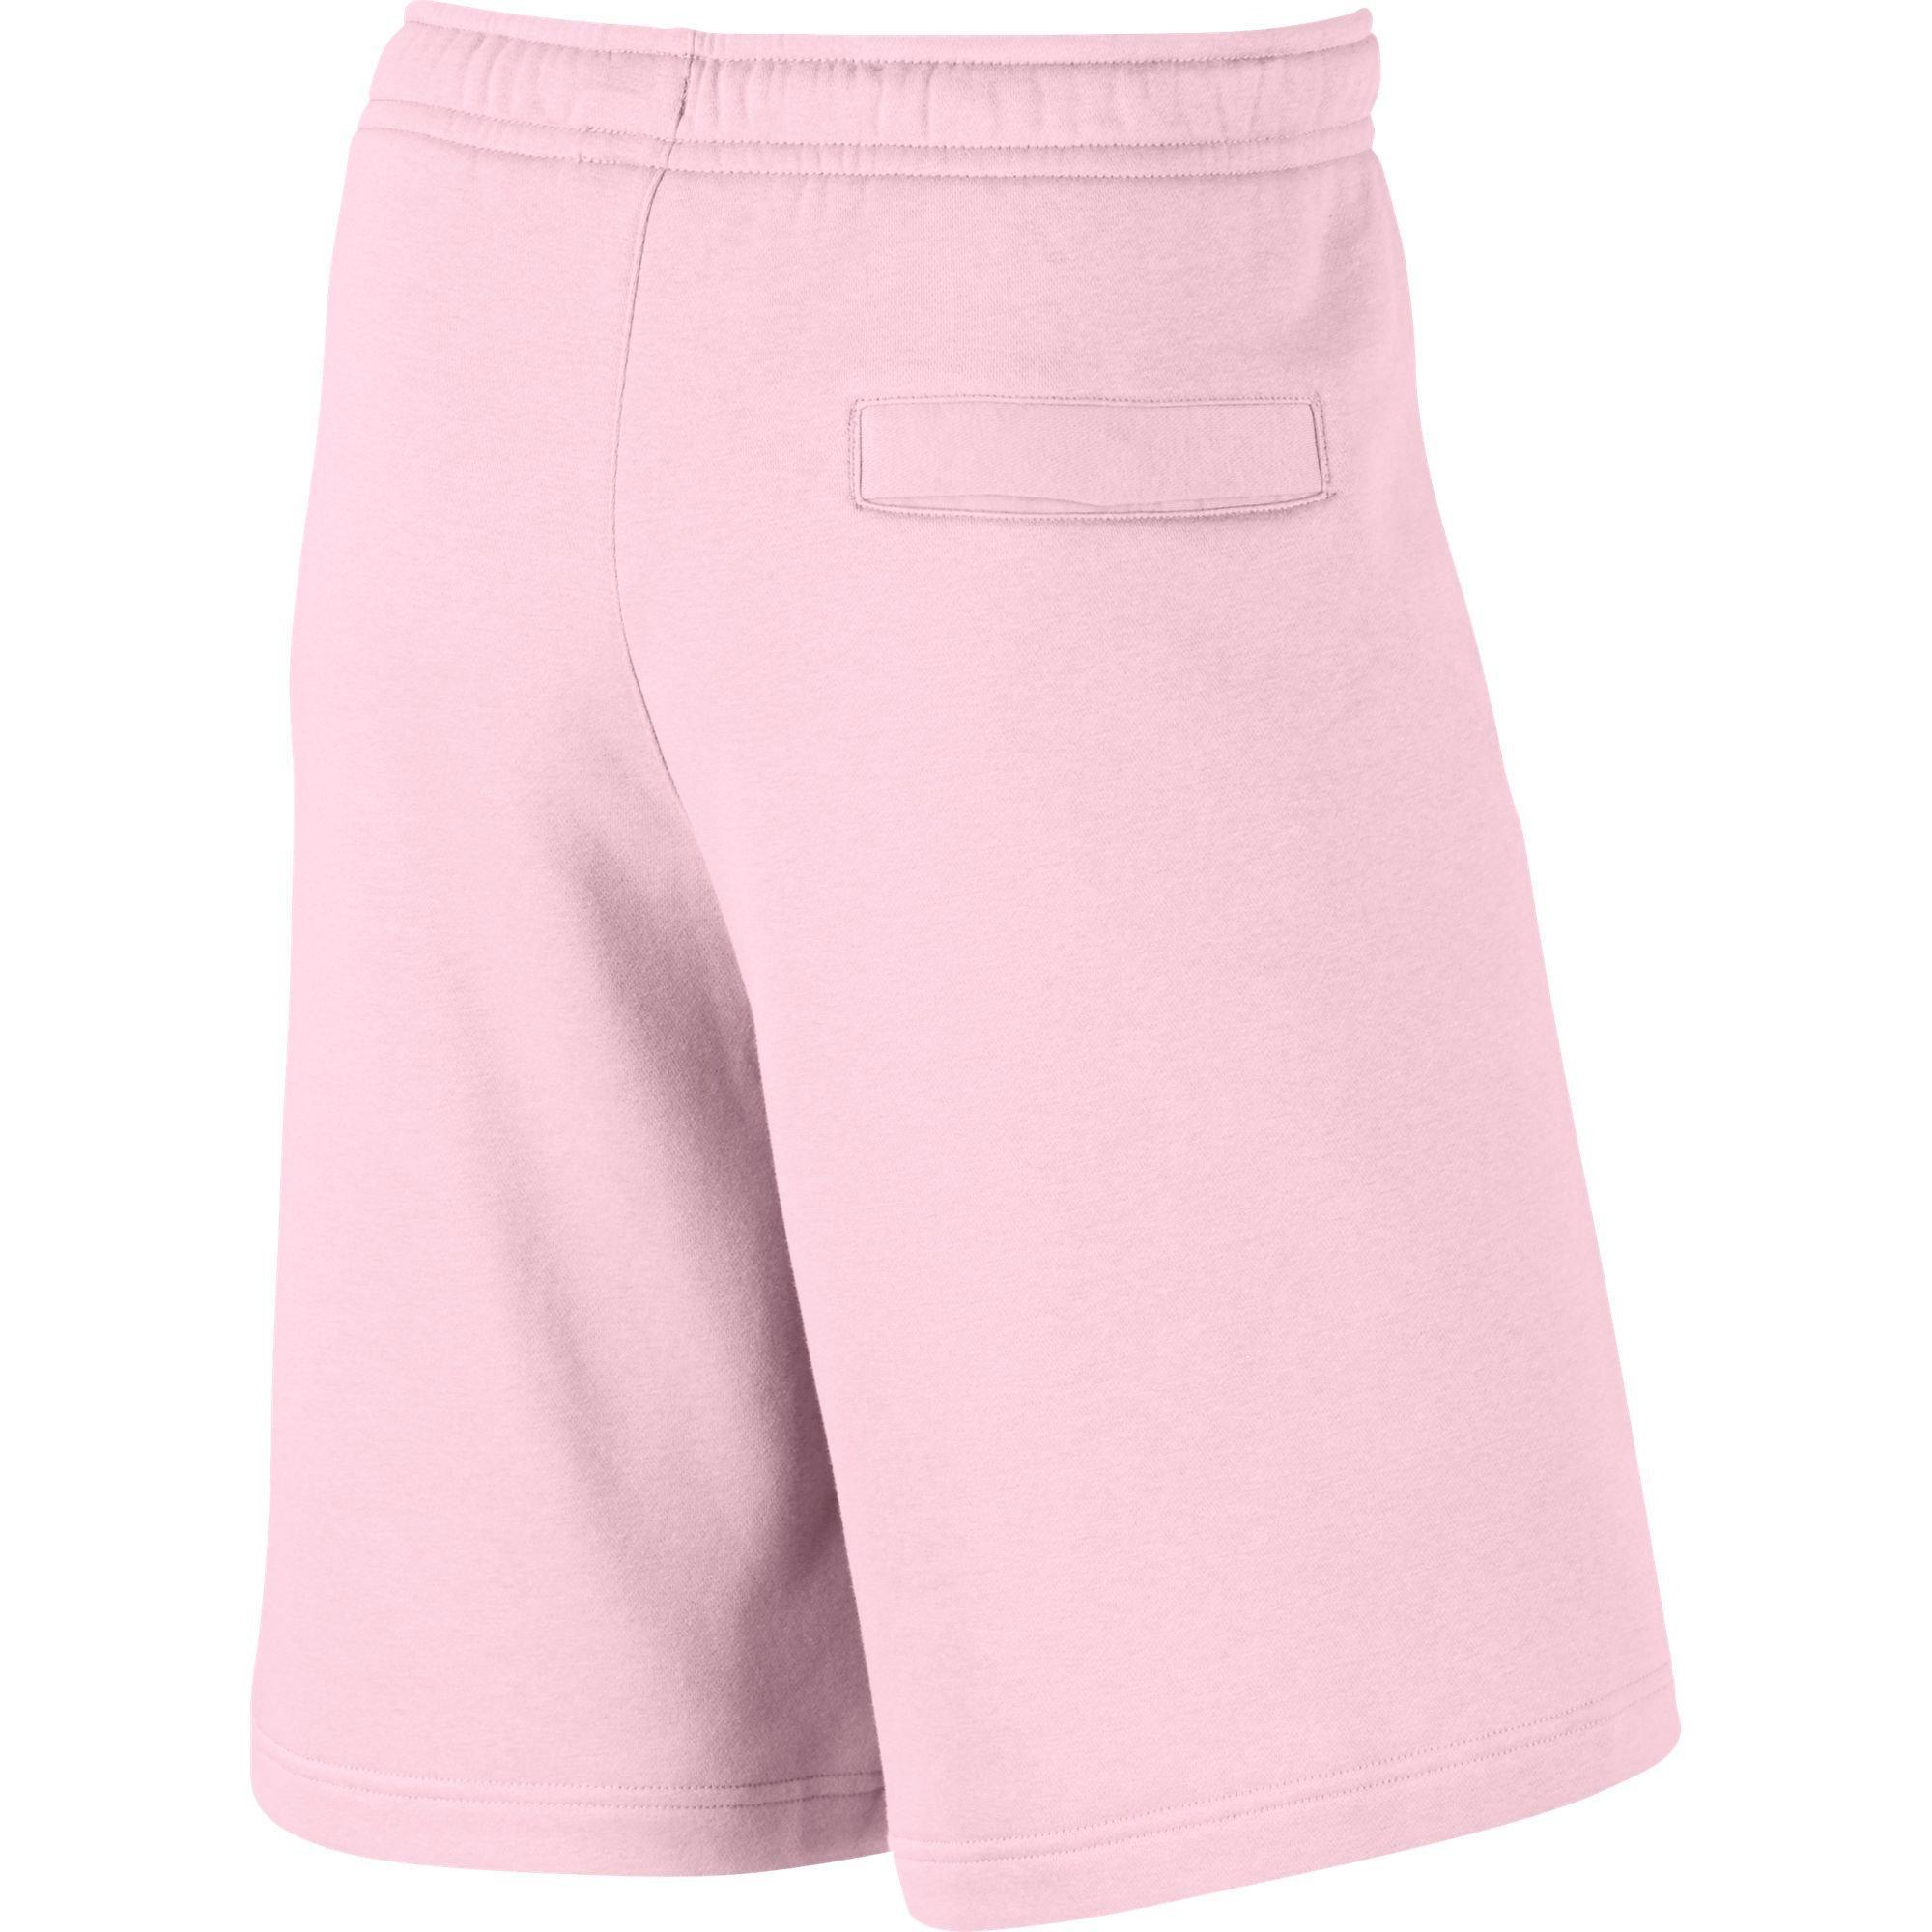 Nike Men's Club Fleece Shorts - Hibbett